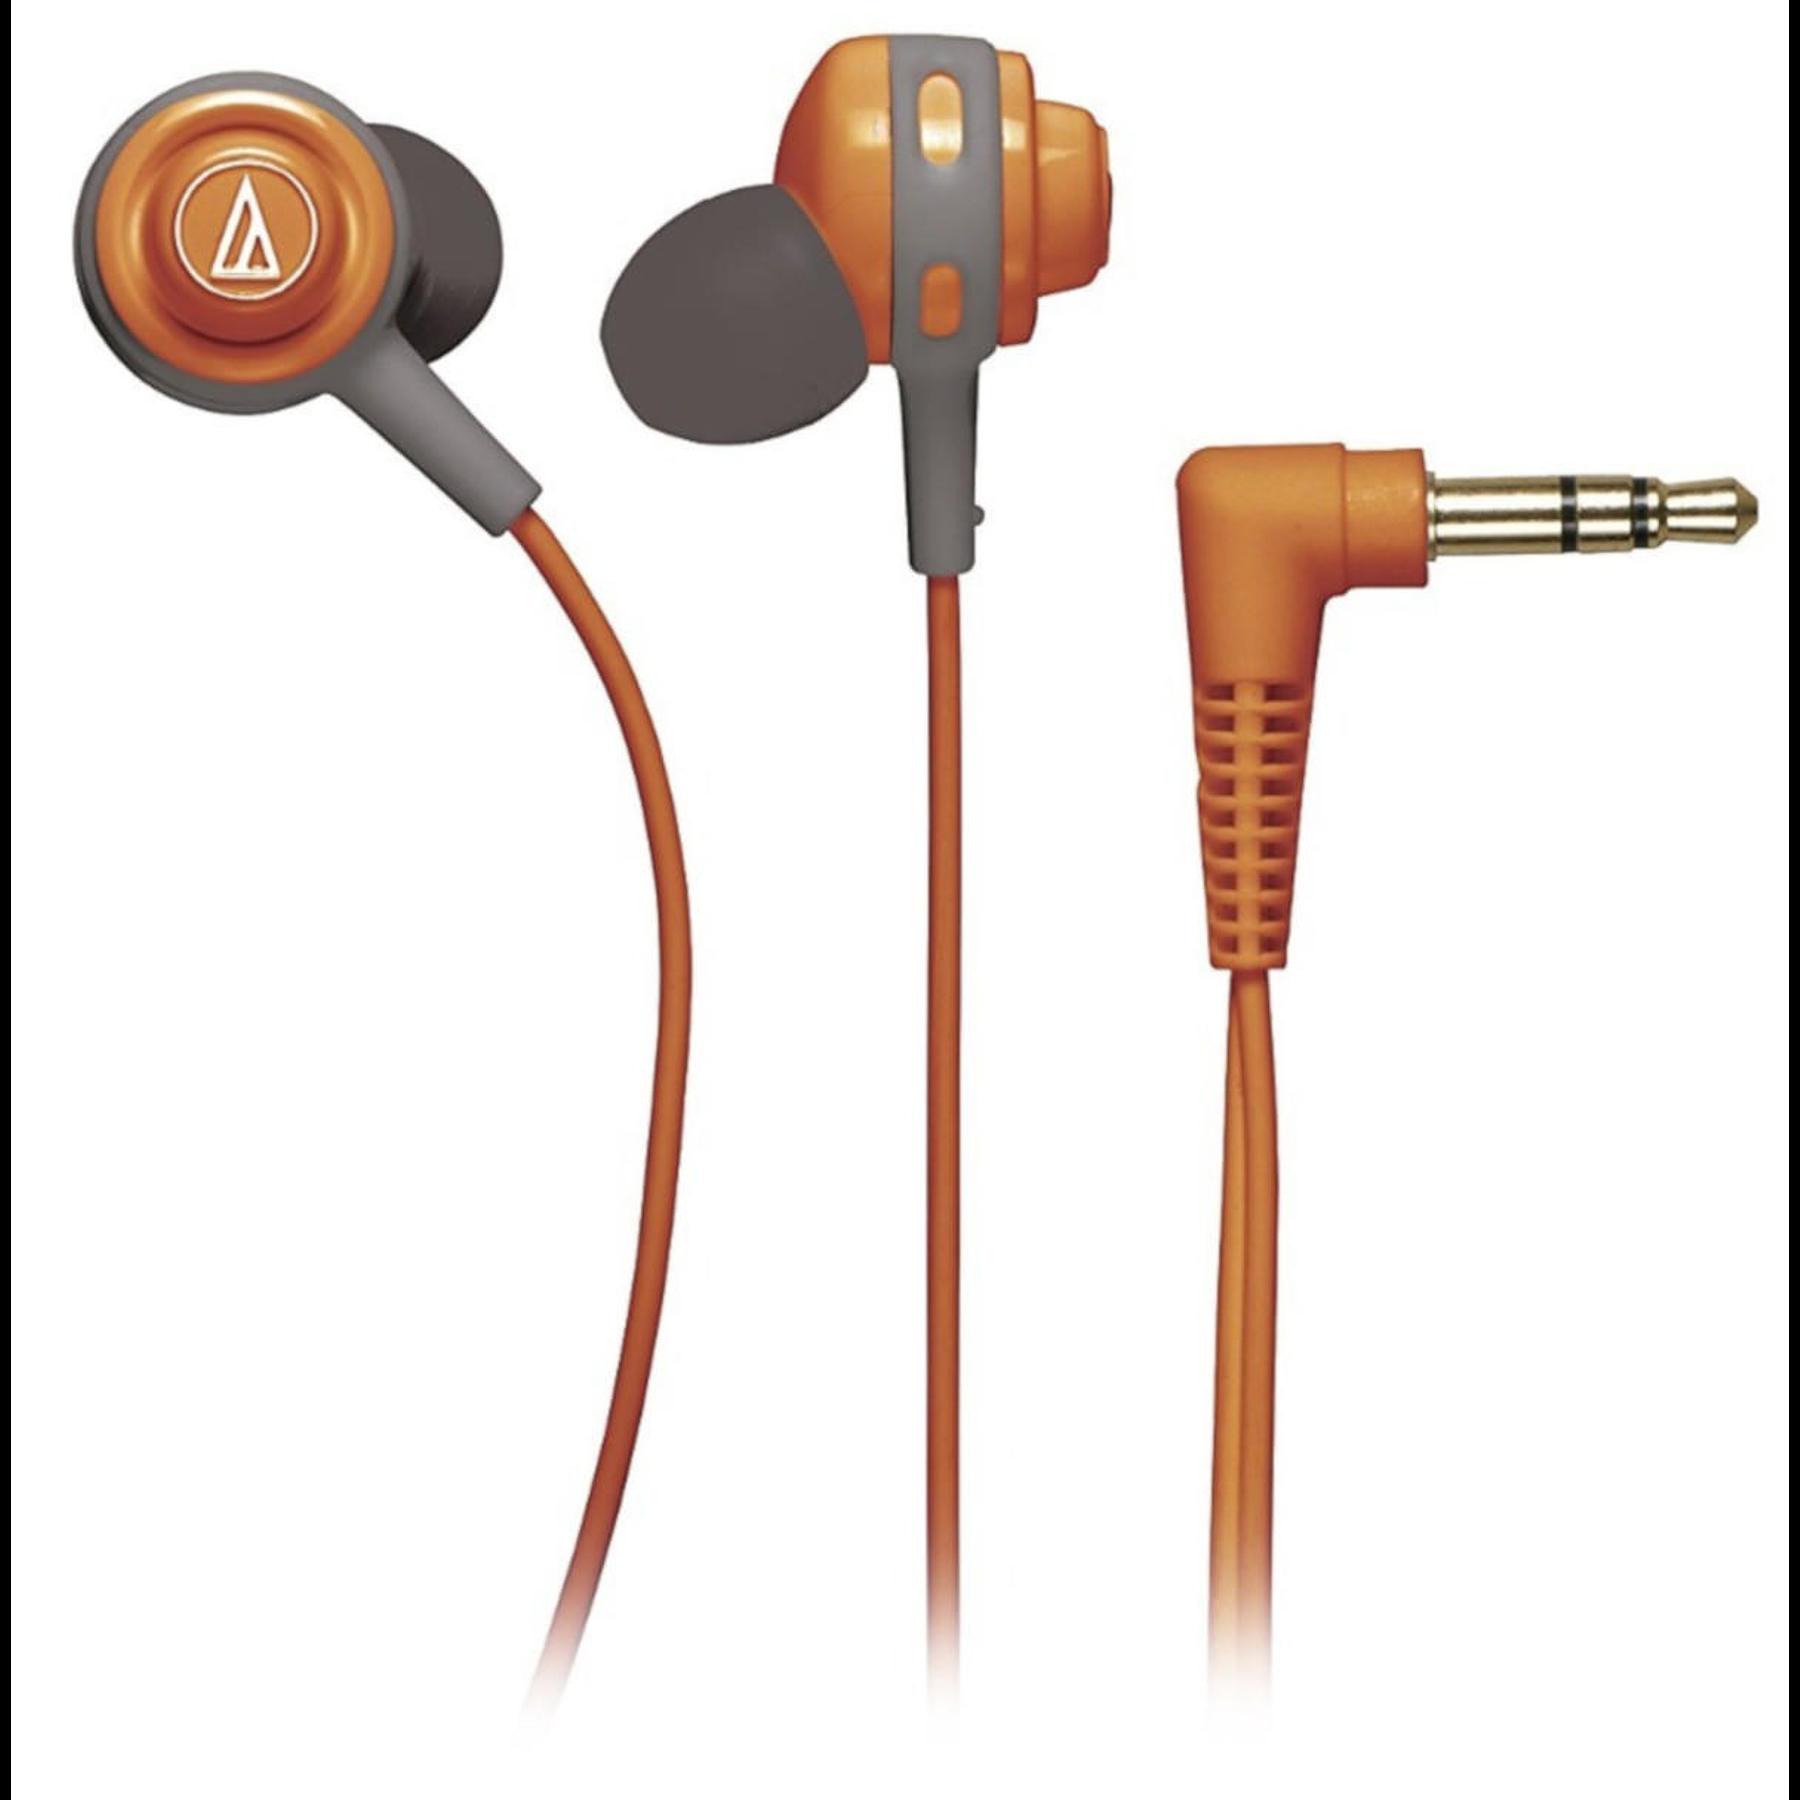 Audifonos de monitoreo AudioTechnica ATH-COR150SP OR